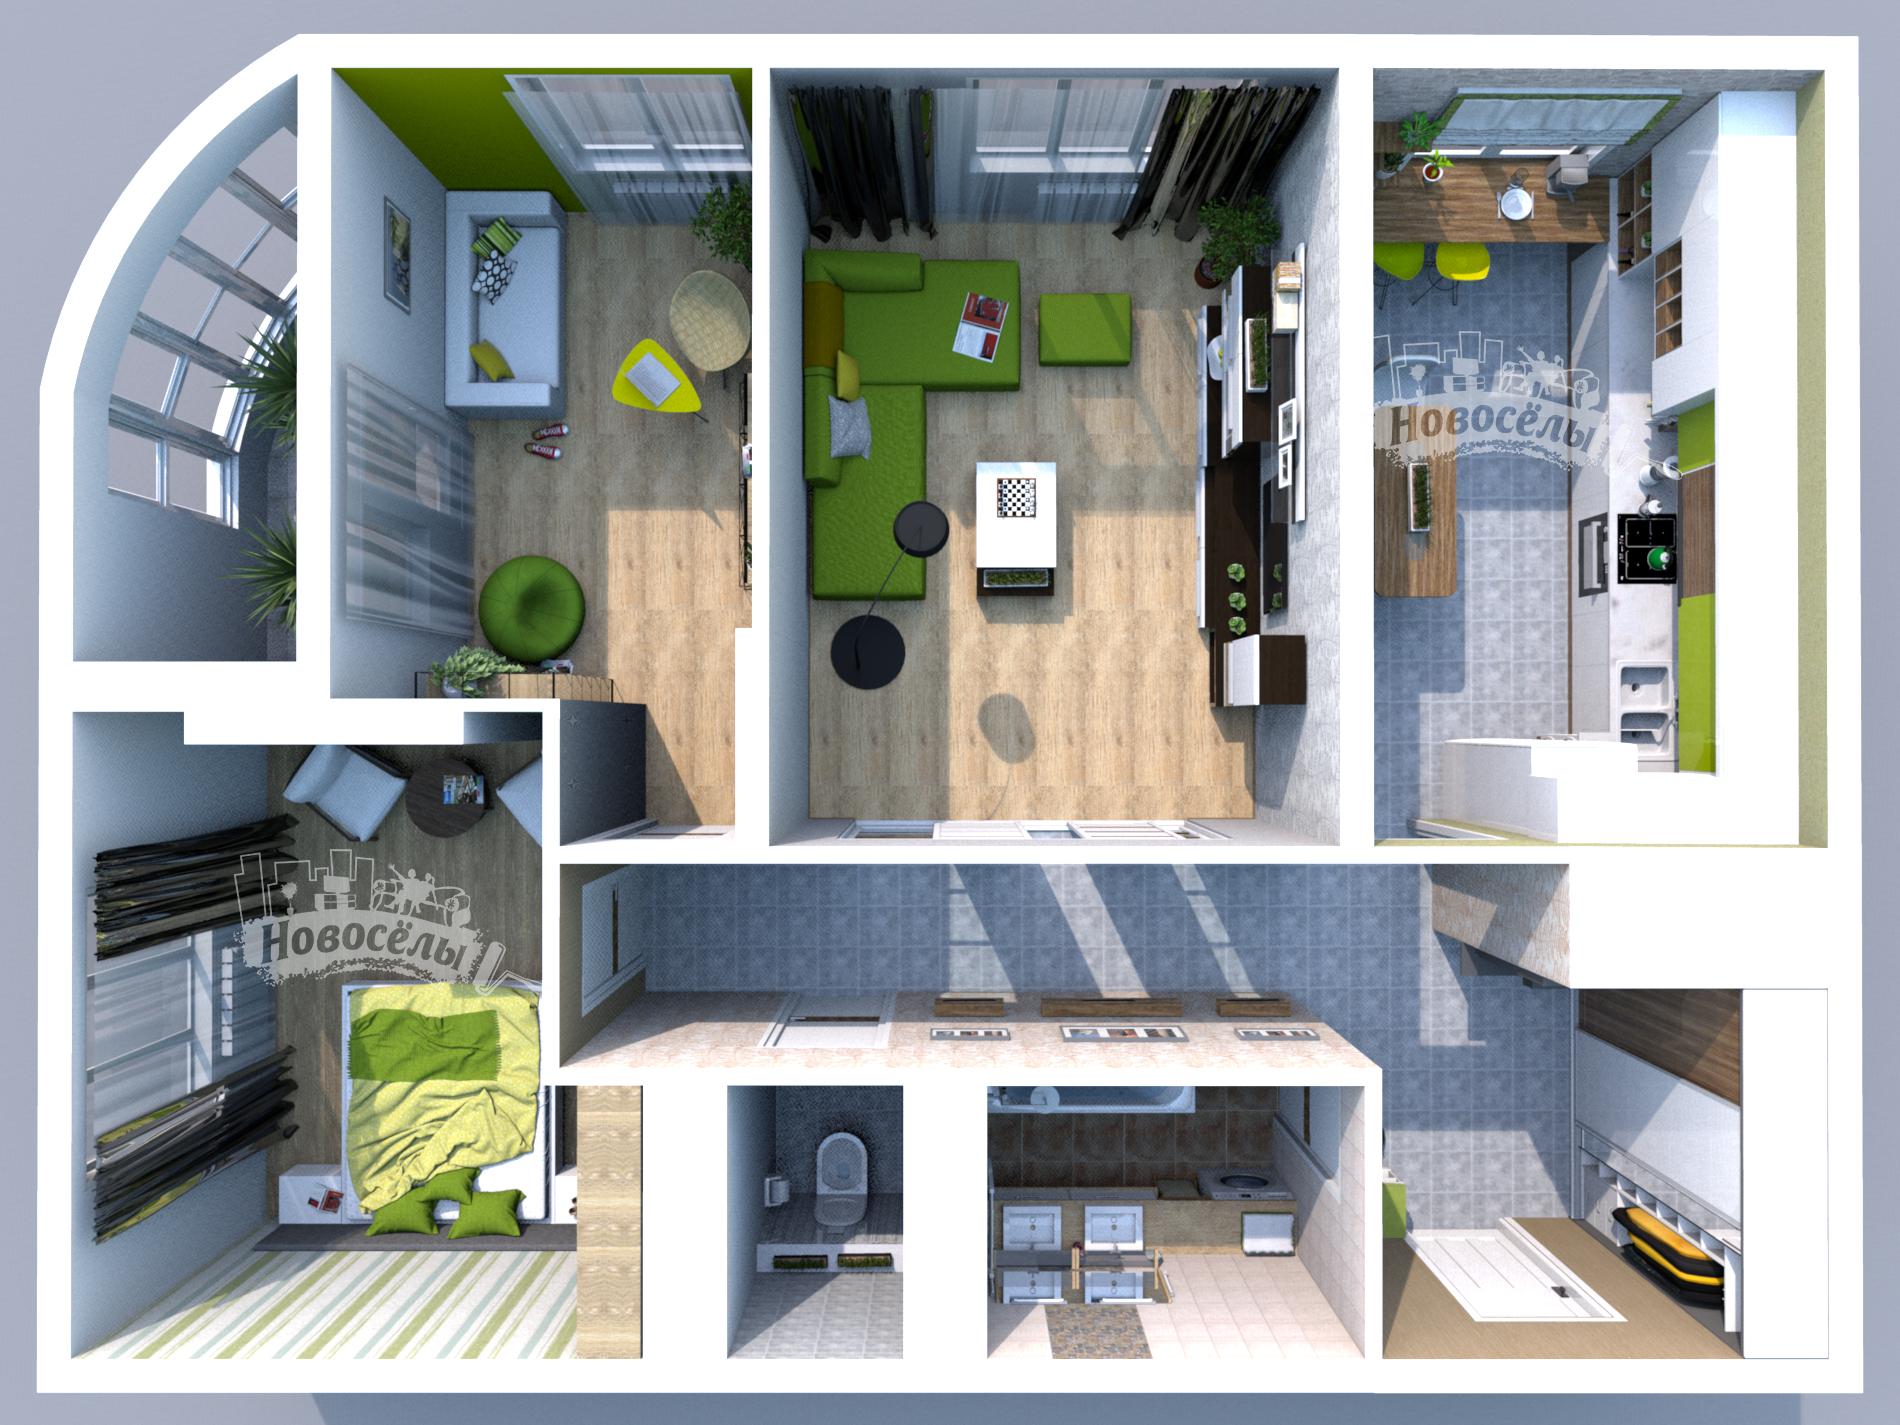 glumilino- 7-home-3-69,95-city-forest